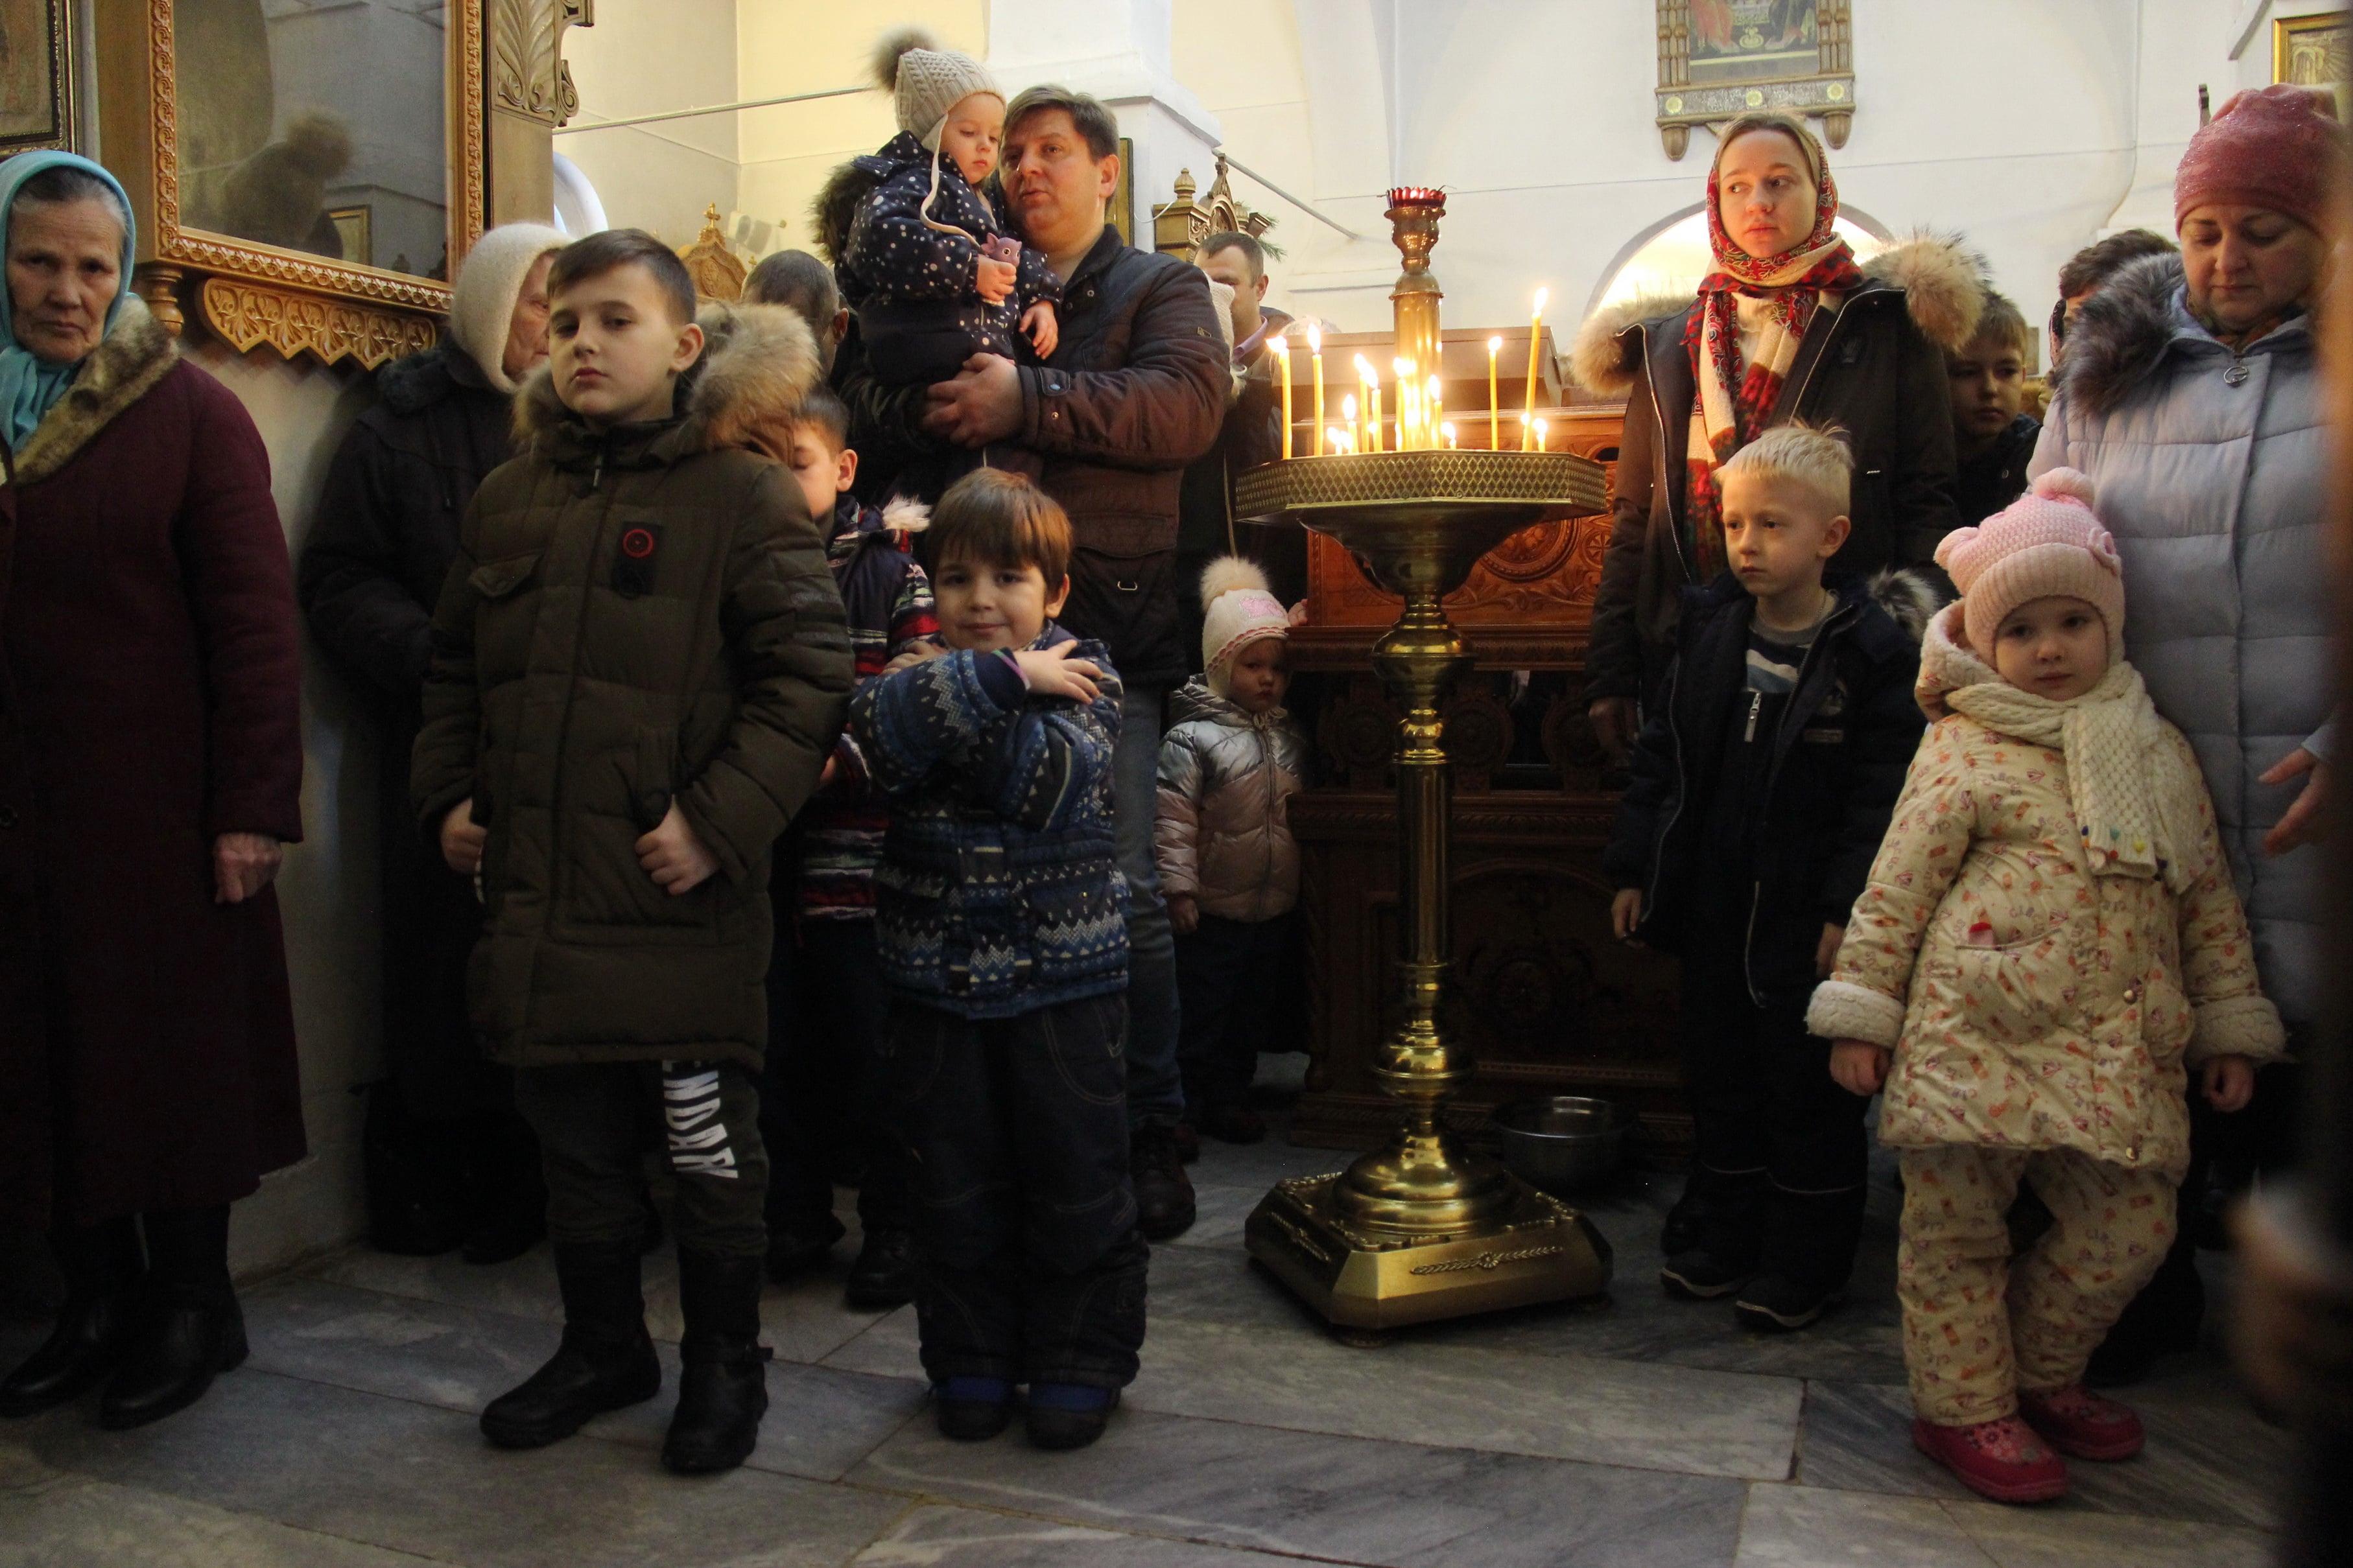 http://monuspen.ru/photoreports/2663d67533f8bbe794375b460e63e956.JPG